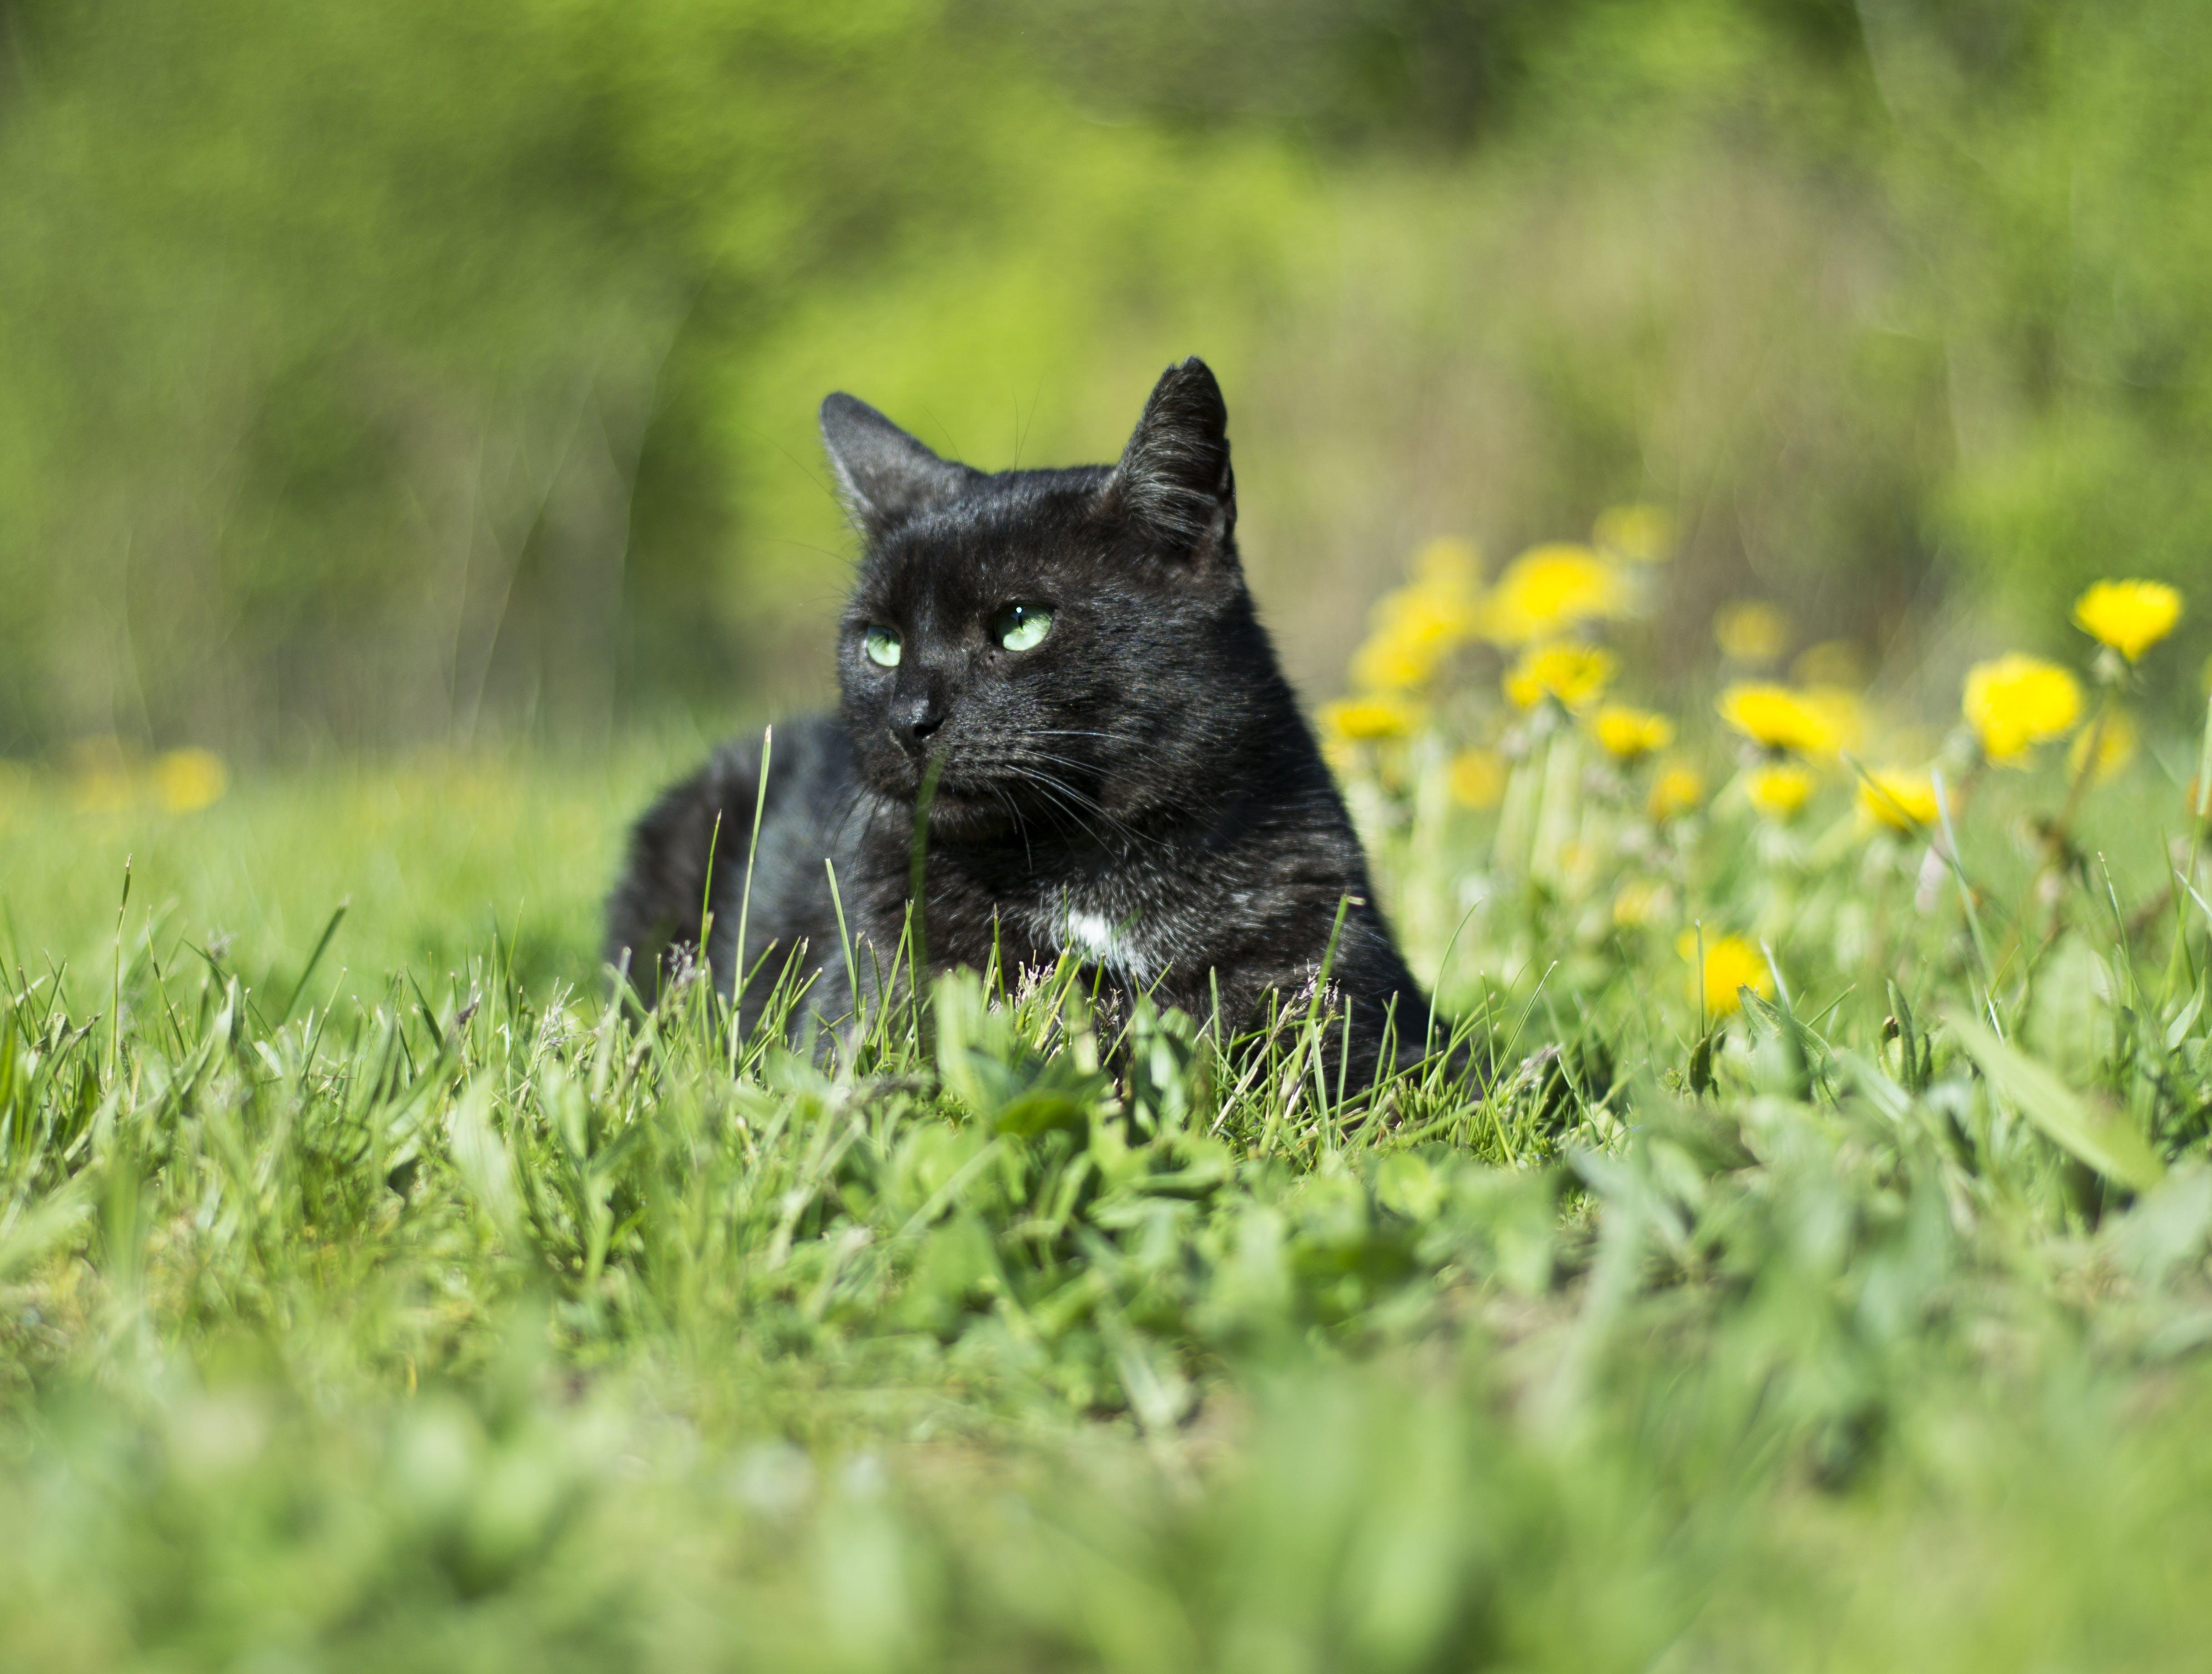 Free stock photo of animals, black, cat, charming